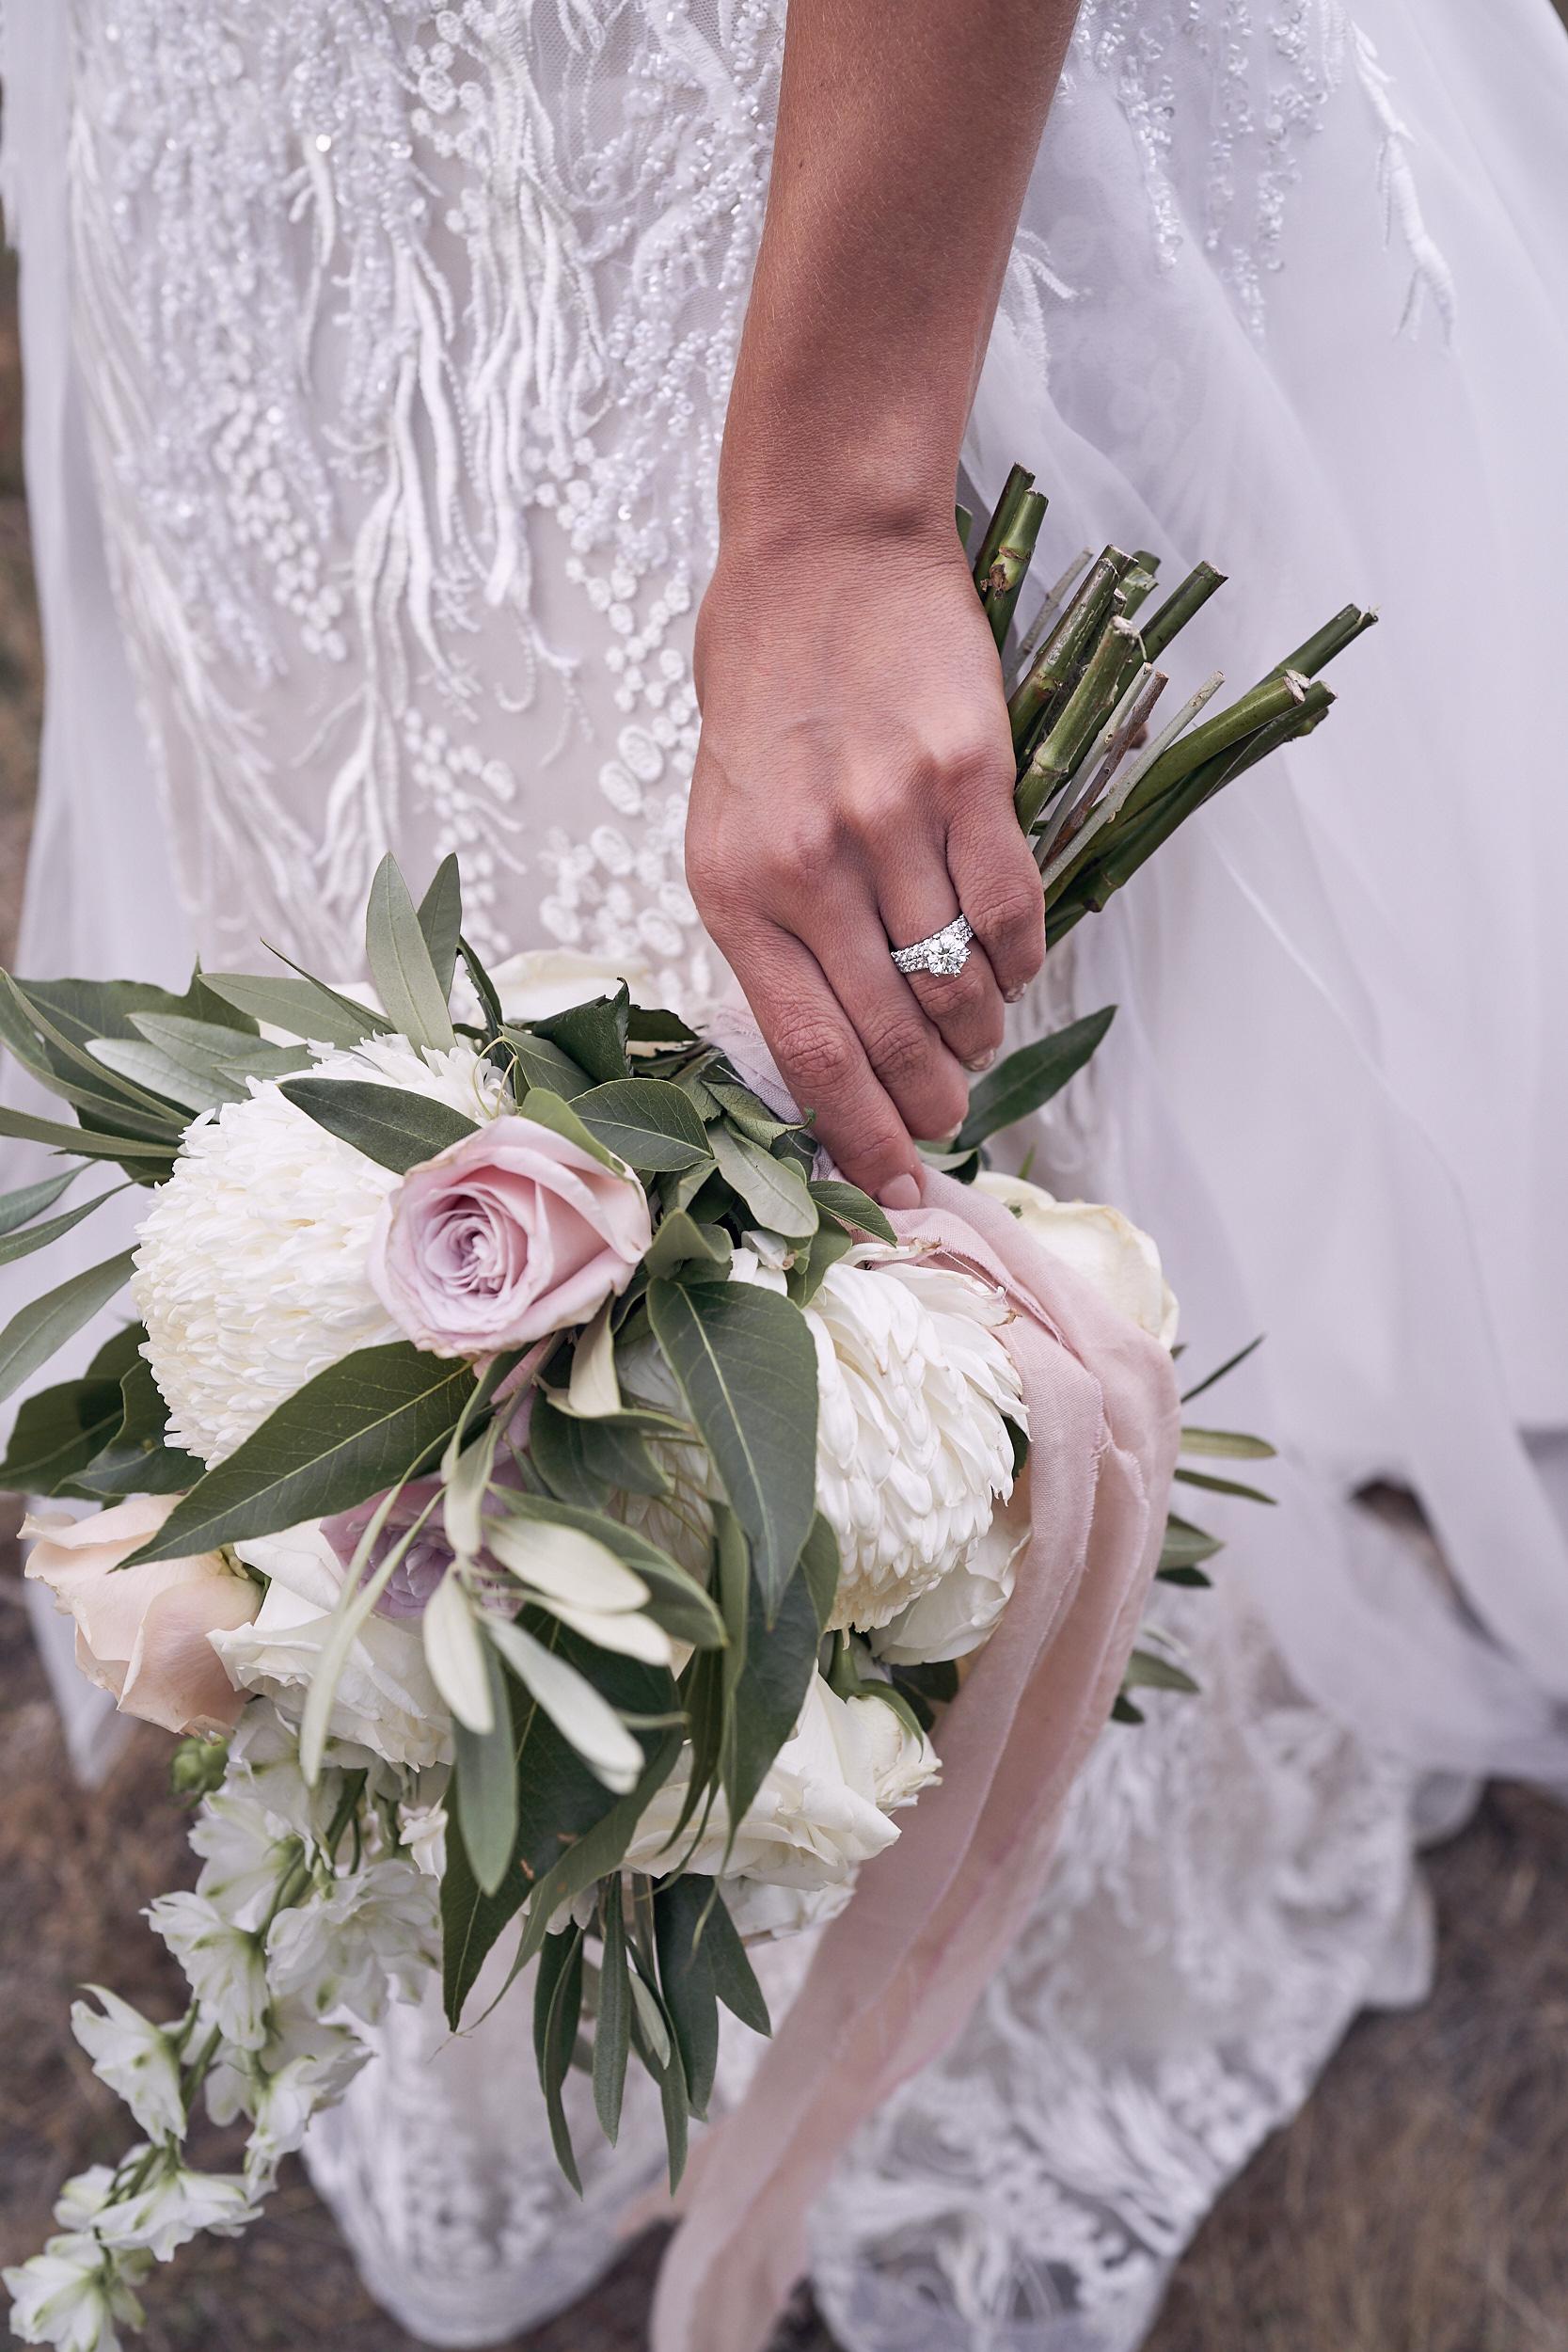 LR_JandA-aravina-wedding-LostInLove 1224.jpg